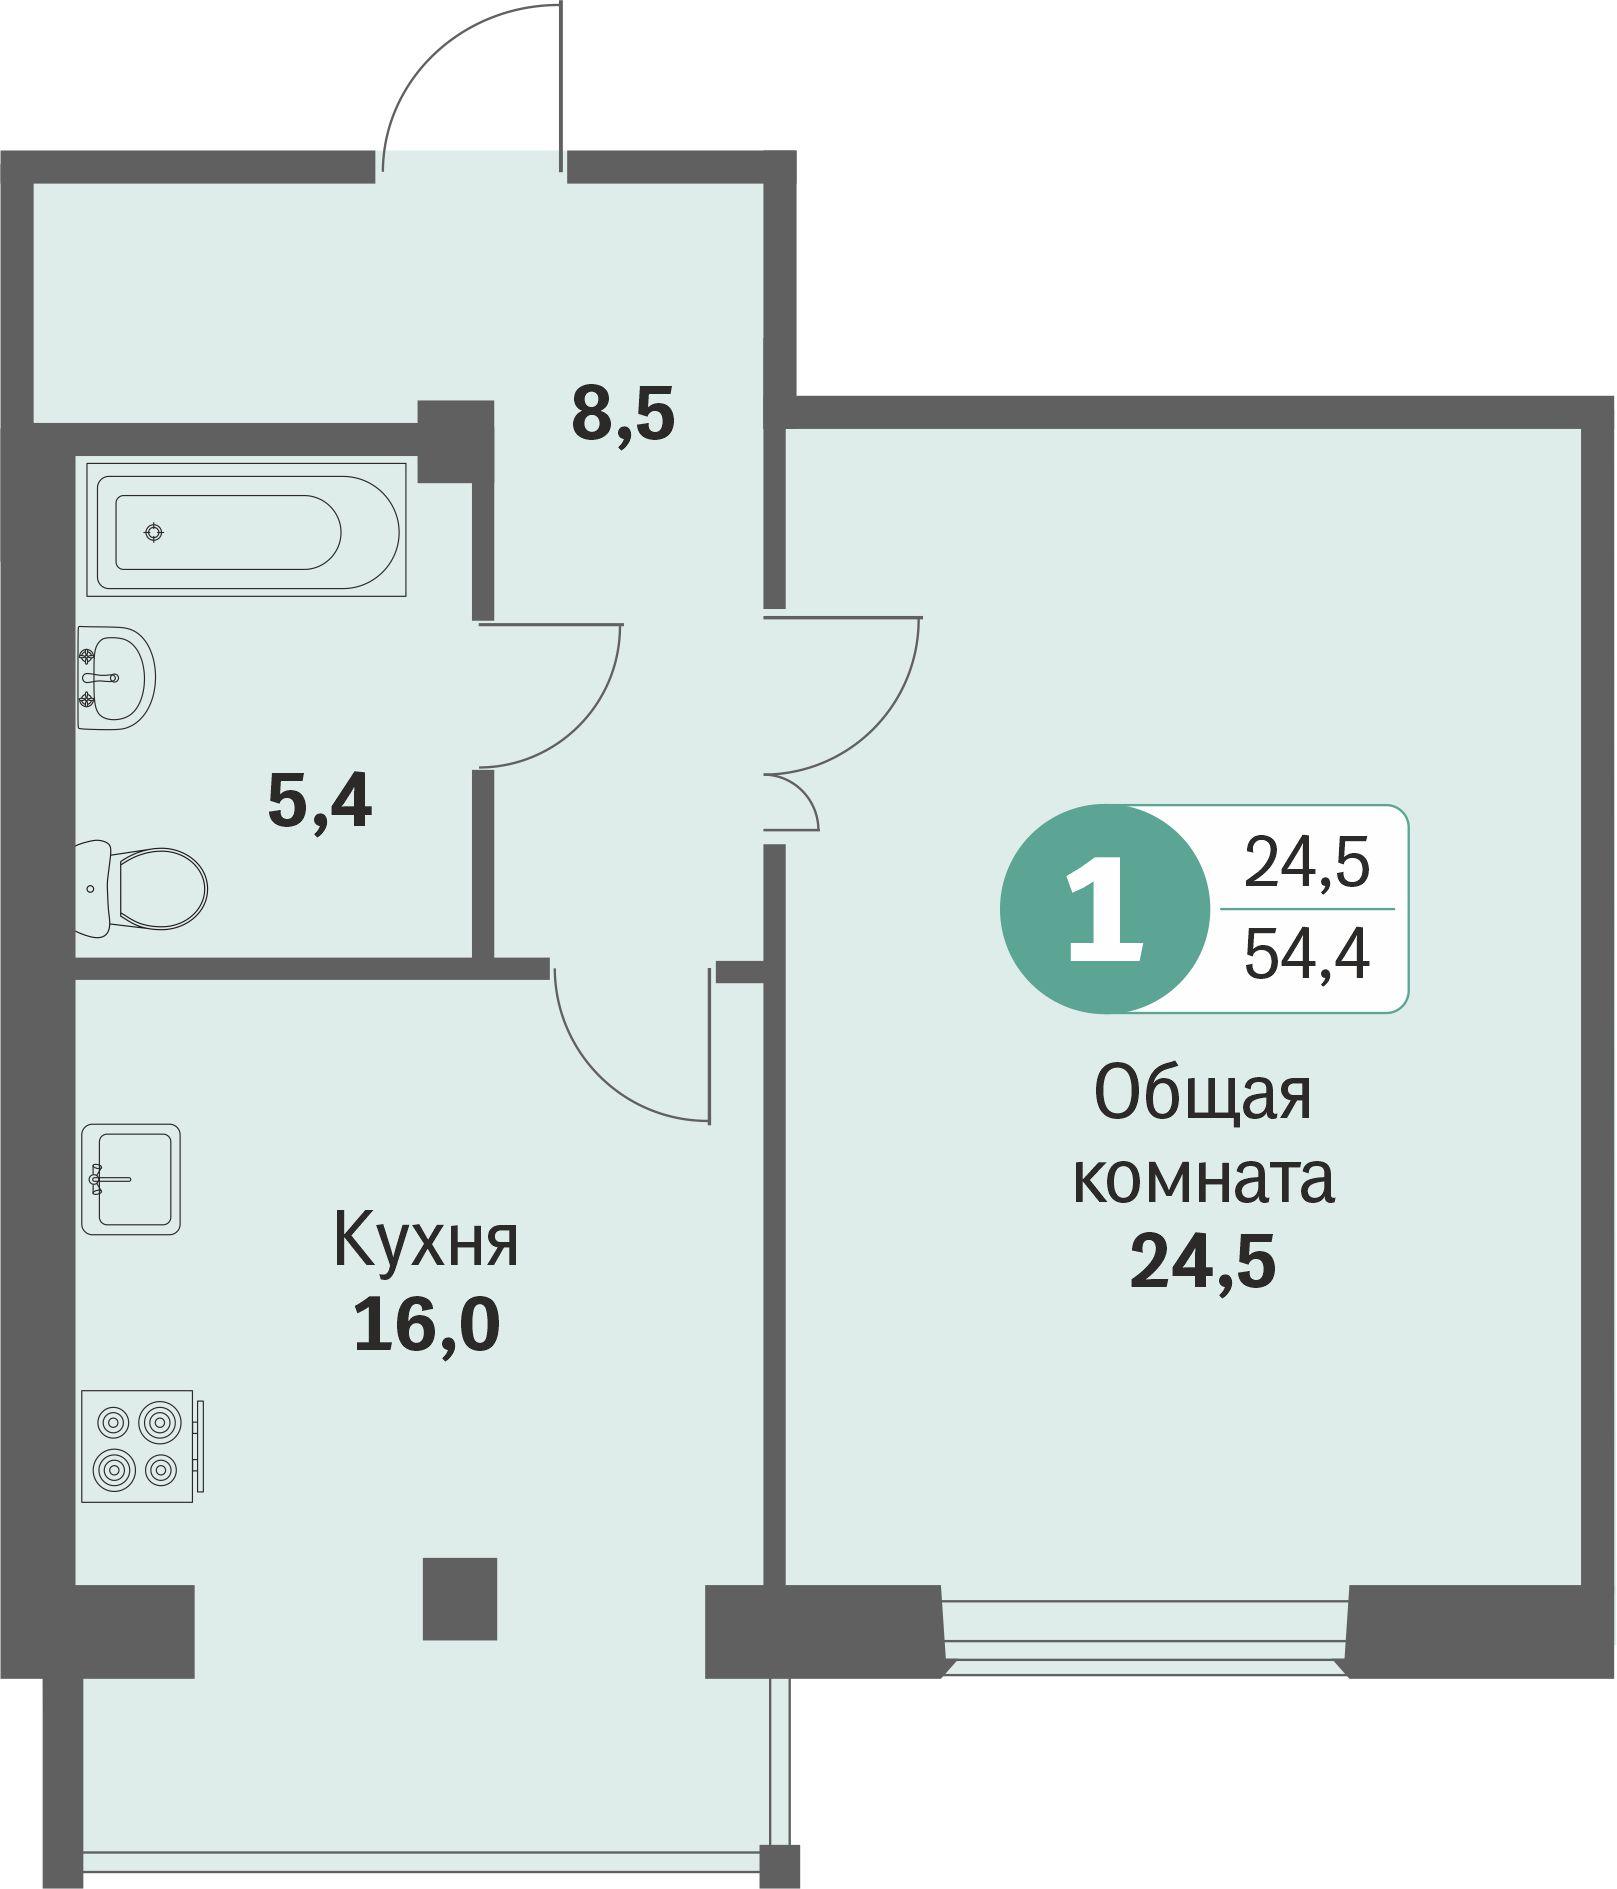 ул. Свиридова, 14, квартира 604 - Однокомнатная